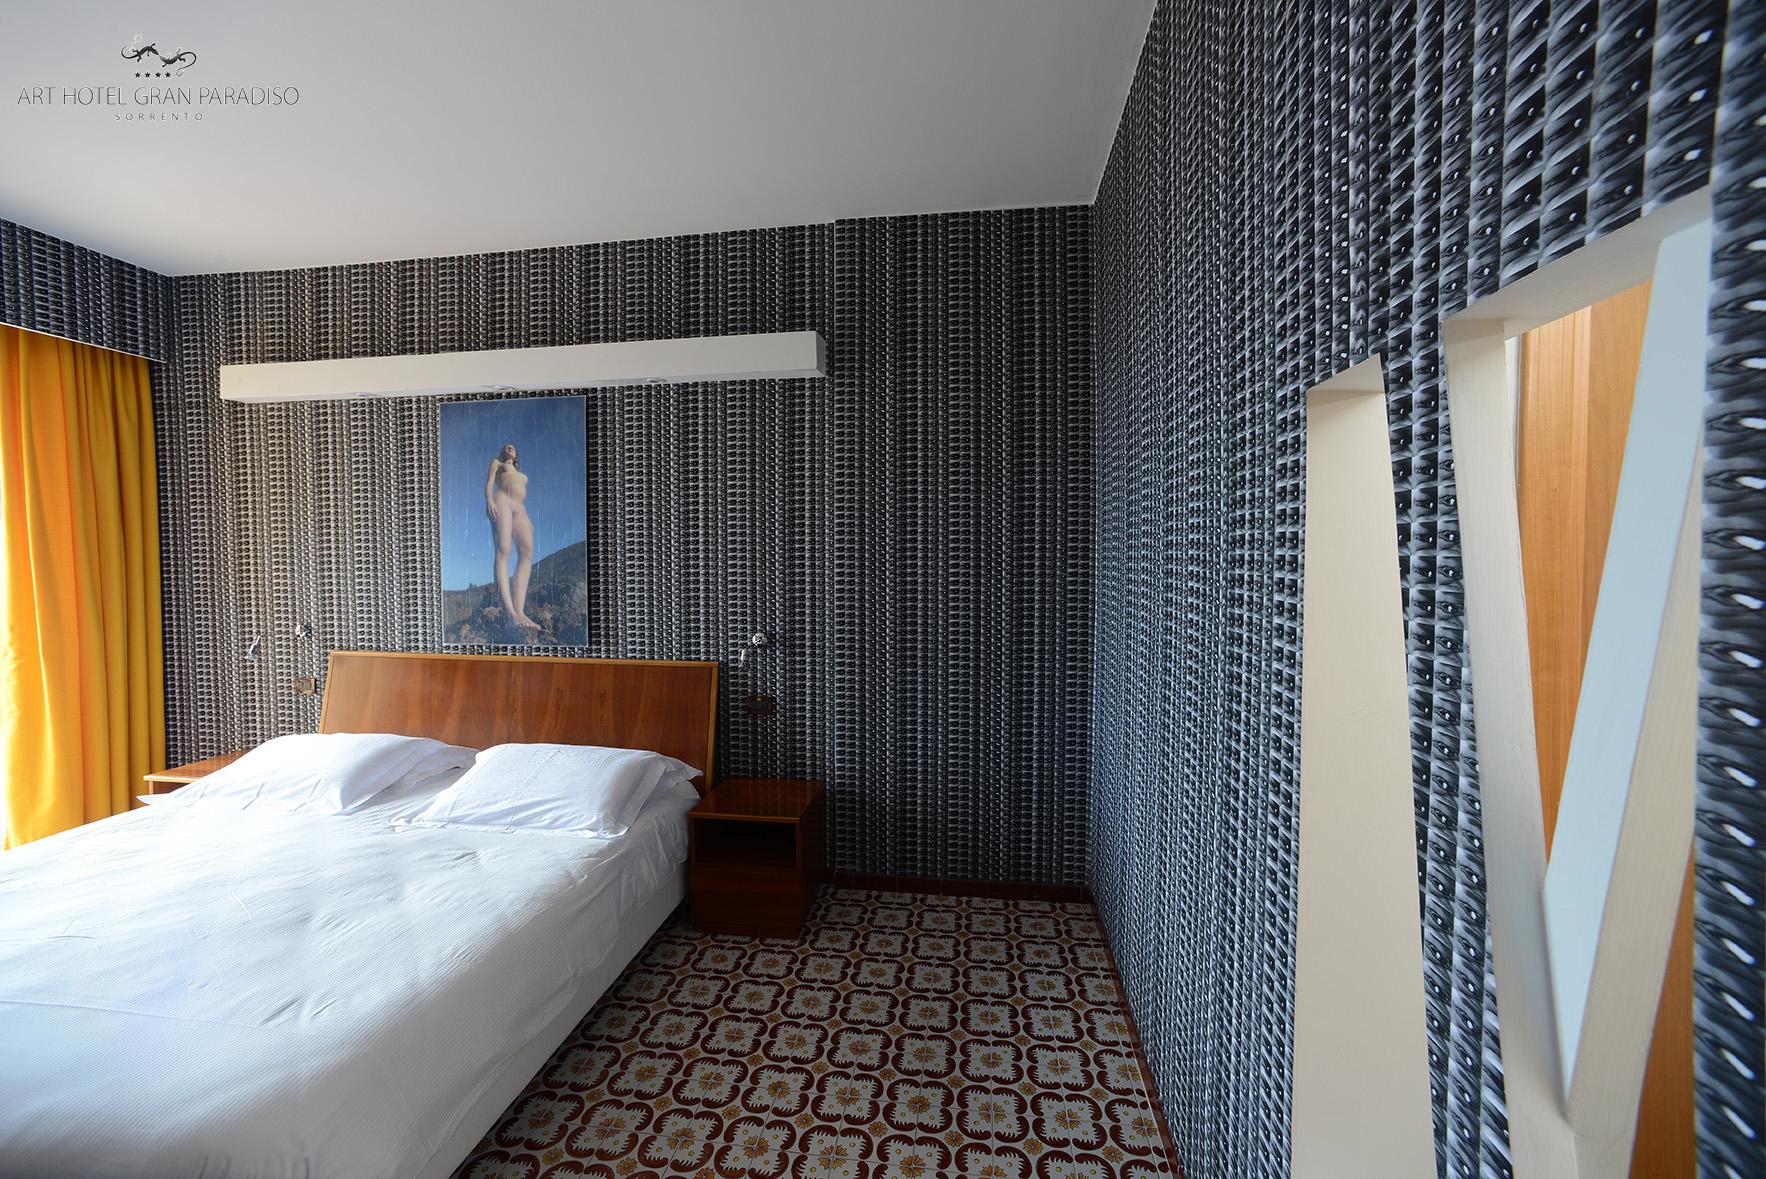 Art_Hotel_Gran_Paradiso_2013_101_Moio&Sivelli_2.jpg